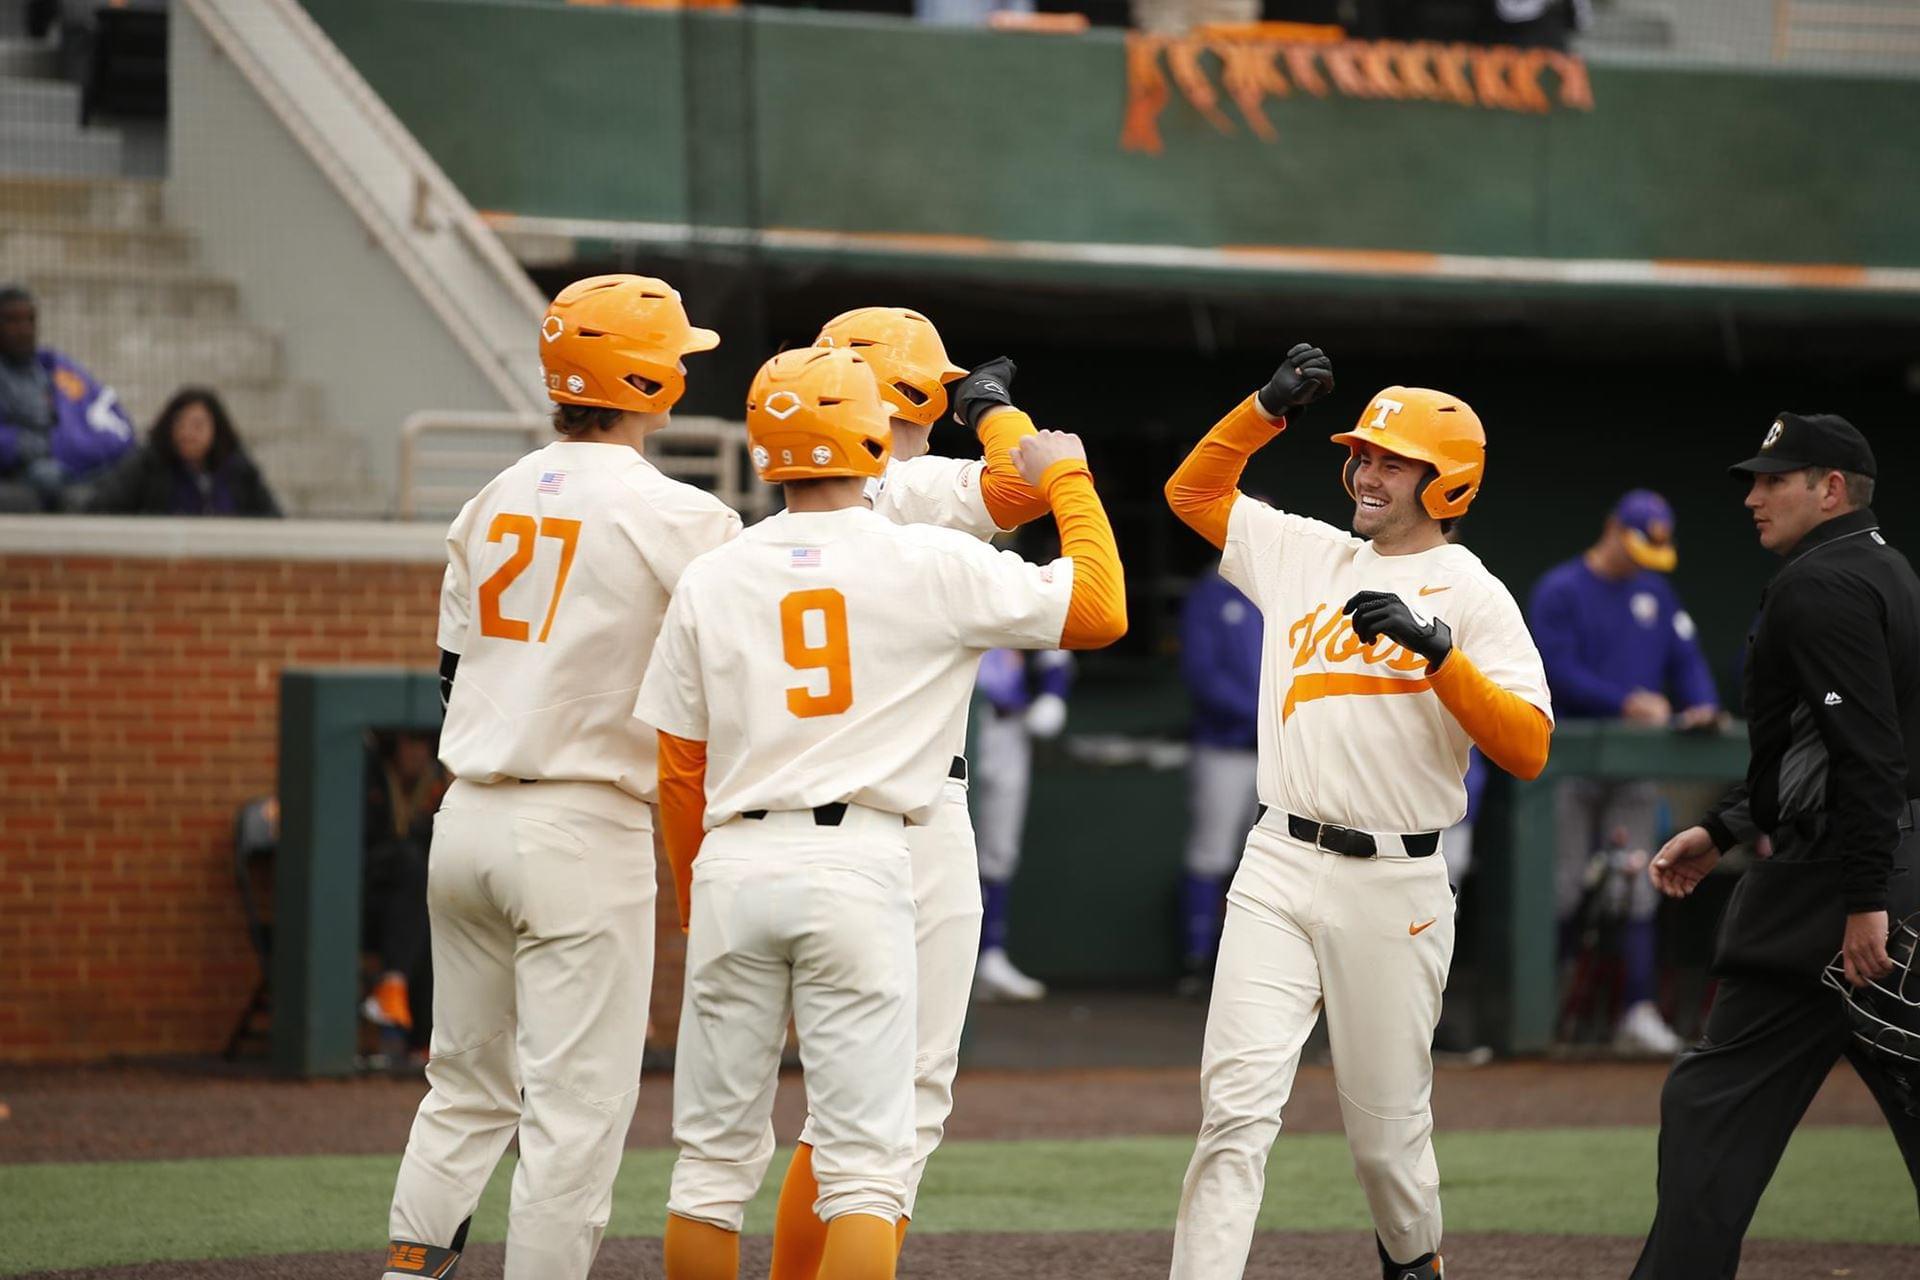 Vols Complete Season-Opening Series Sweep of Western Illinois, 23-4